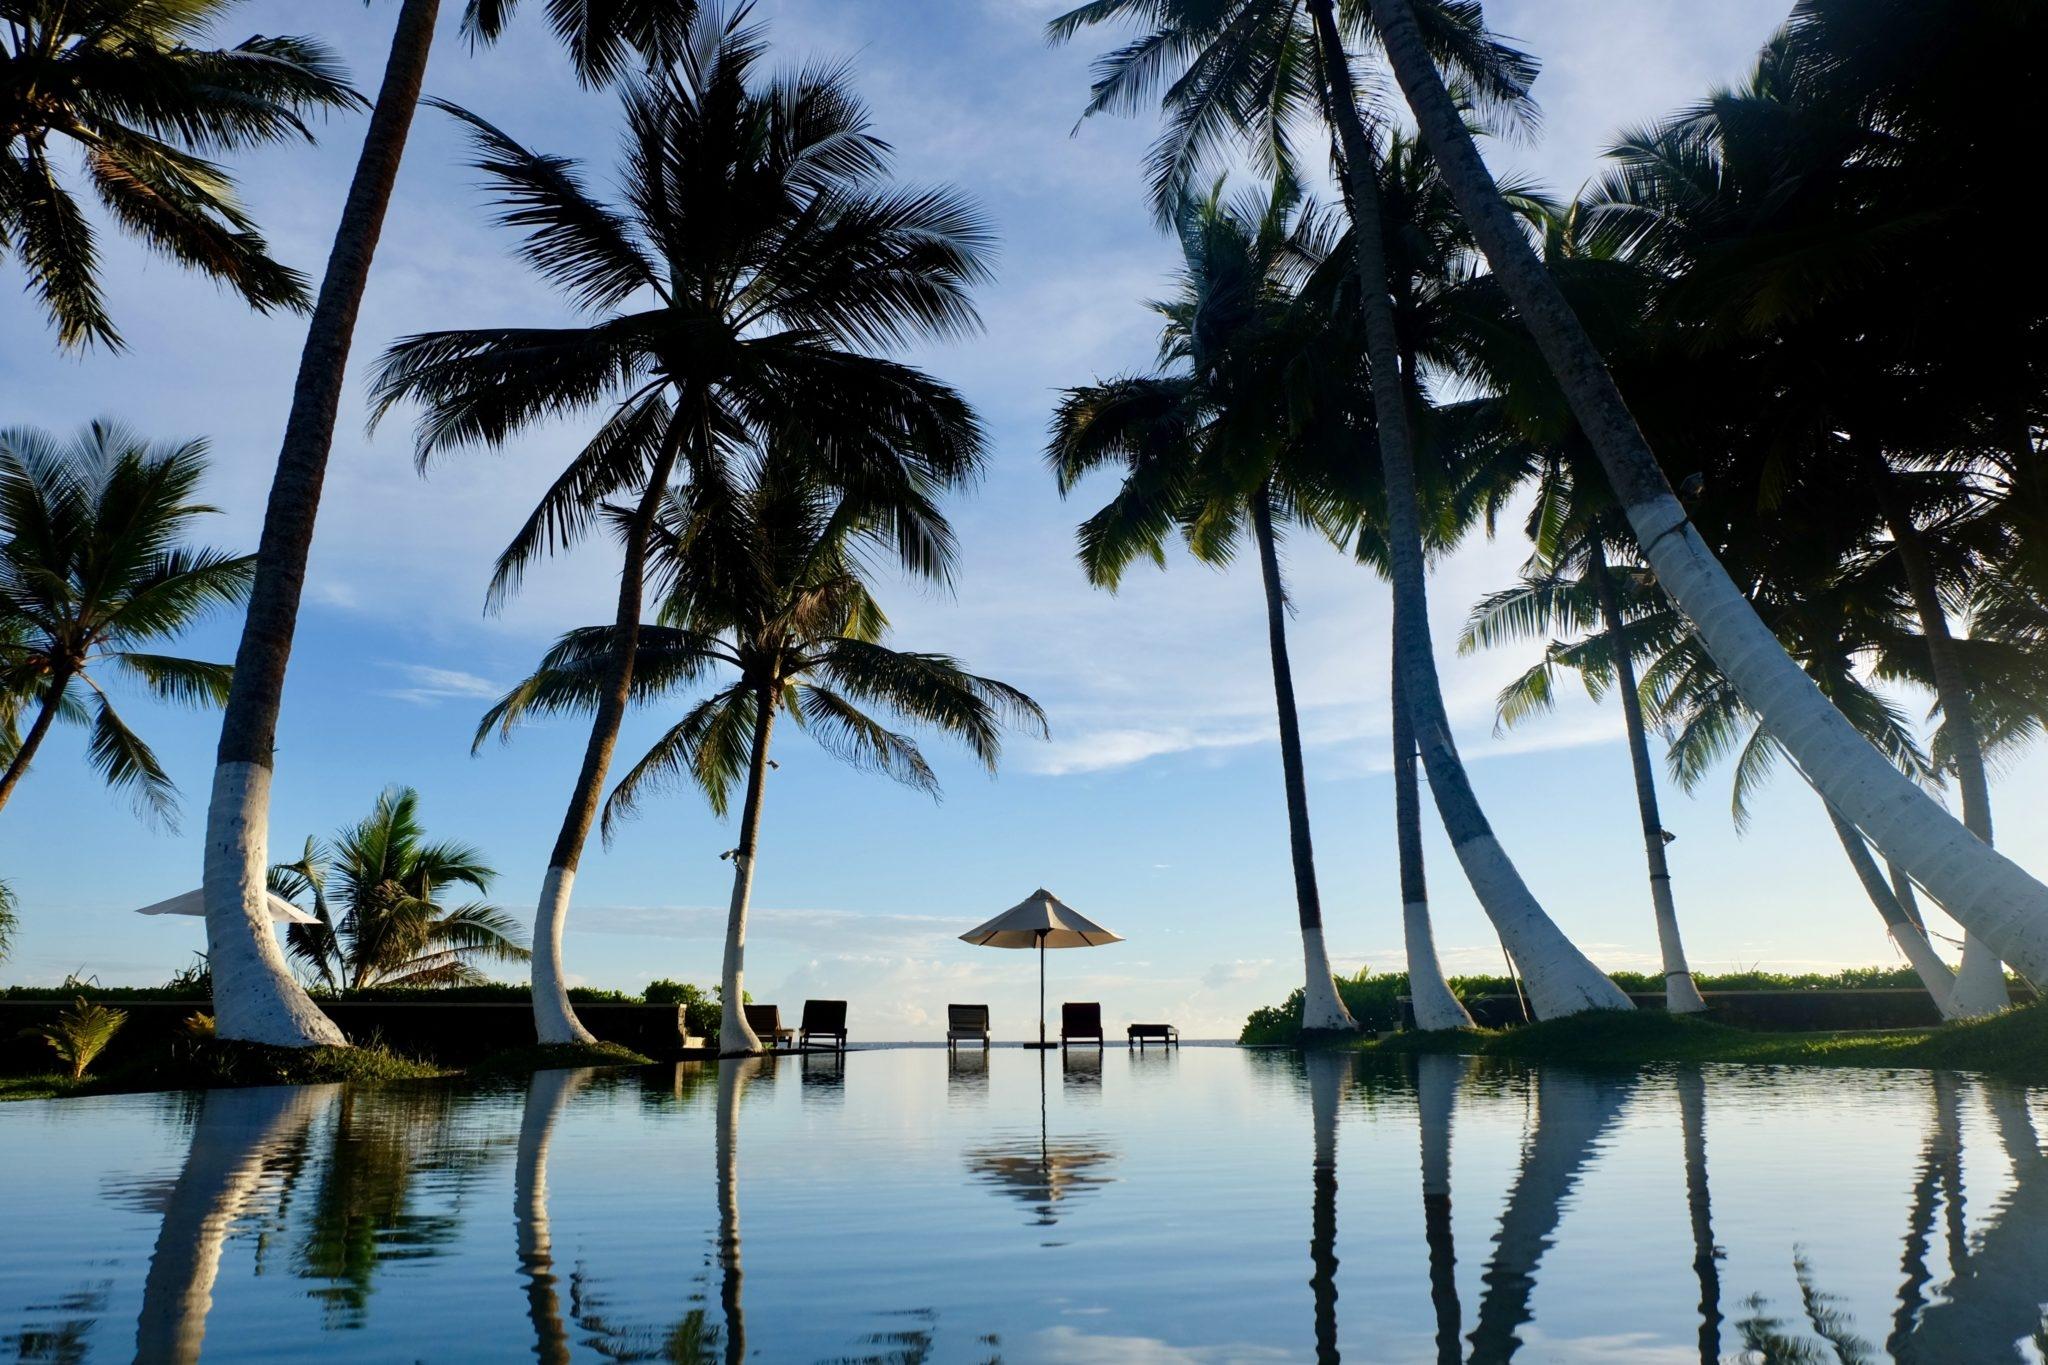 Apa Villa Hotel Sri Lanka